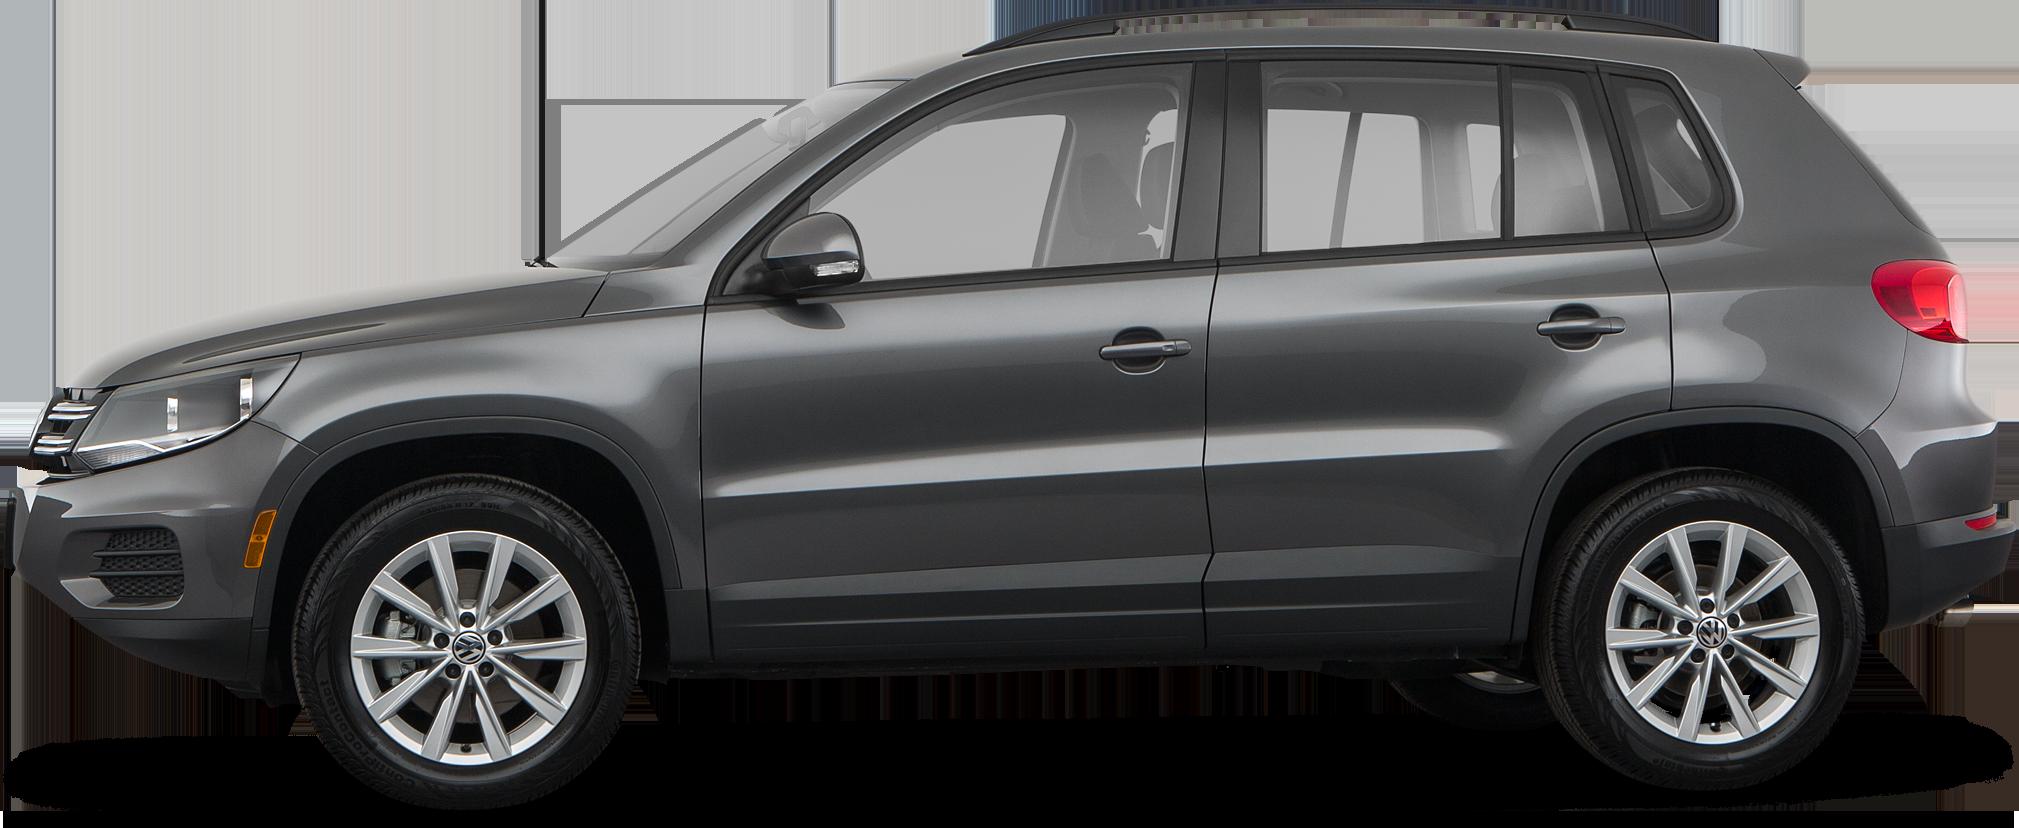 2018 Volkswagen Tiguan Limited SUV 2.0T